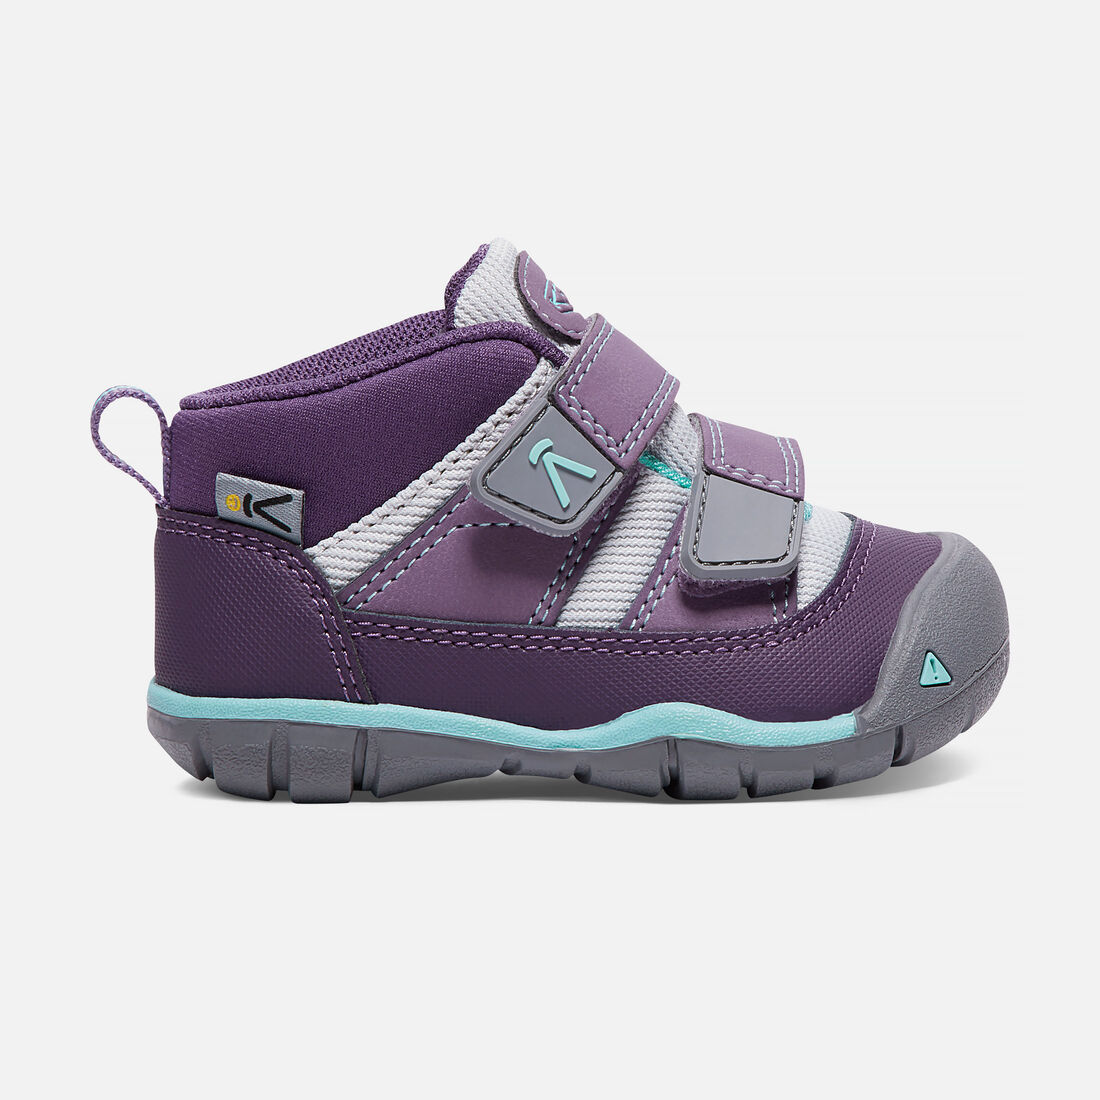 Toddlers' Peek-A-Shoe in Purple Plumeria/Sweet Lavender - large view.